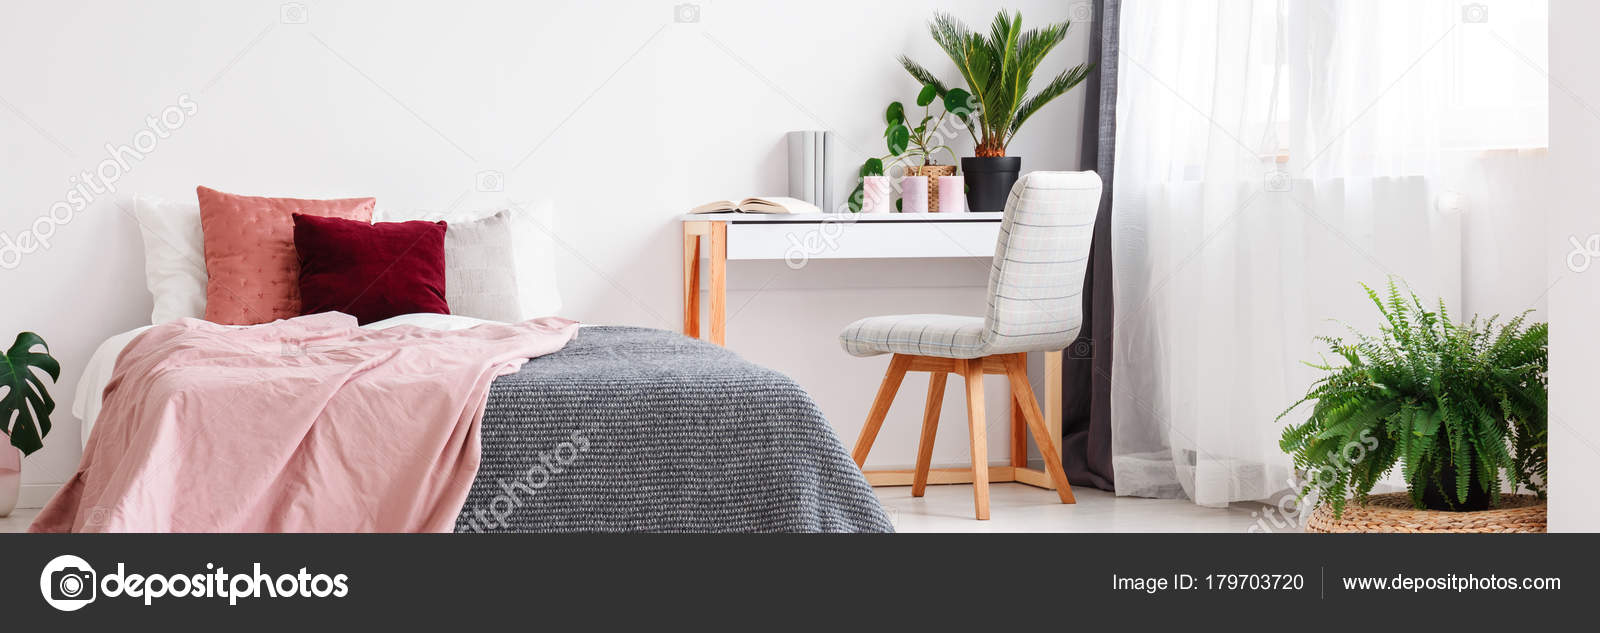 Camera da letto rosa e grigio — Foto Stock © photographee.eu #179703720